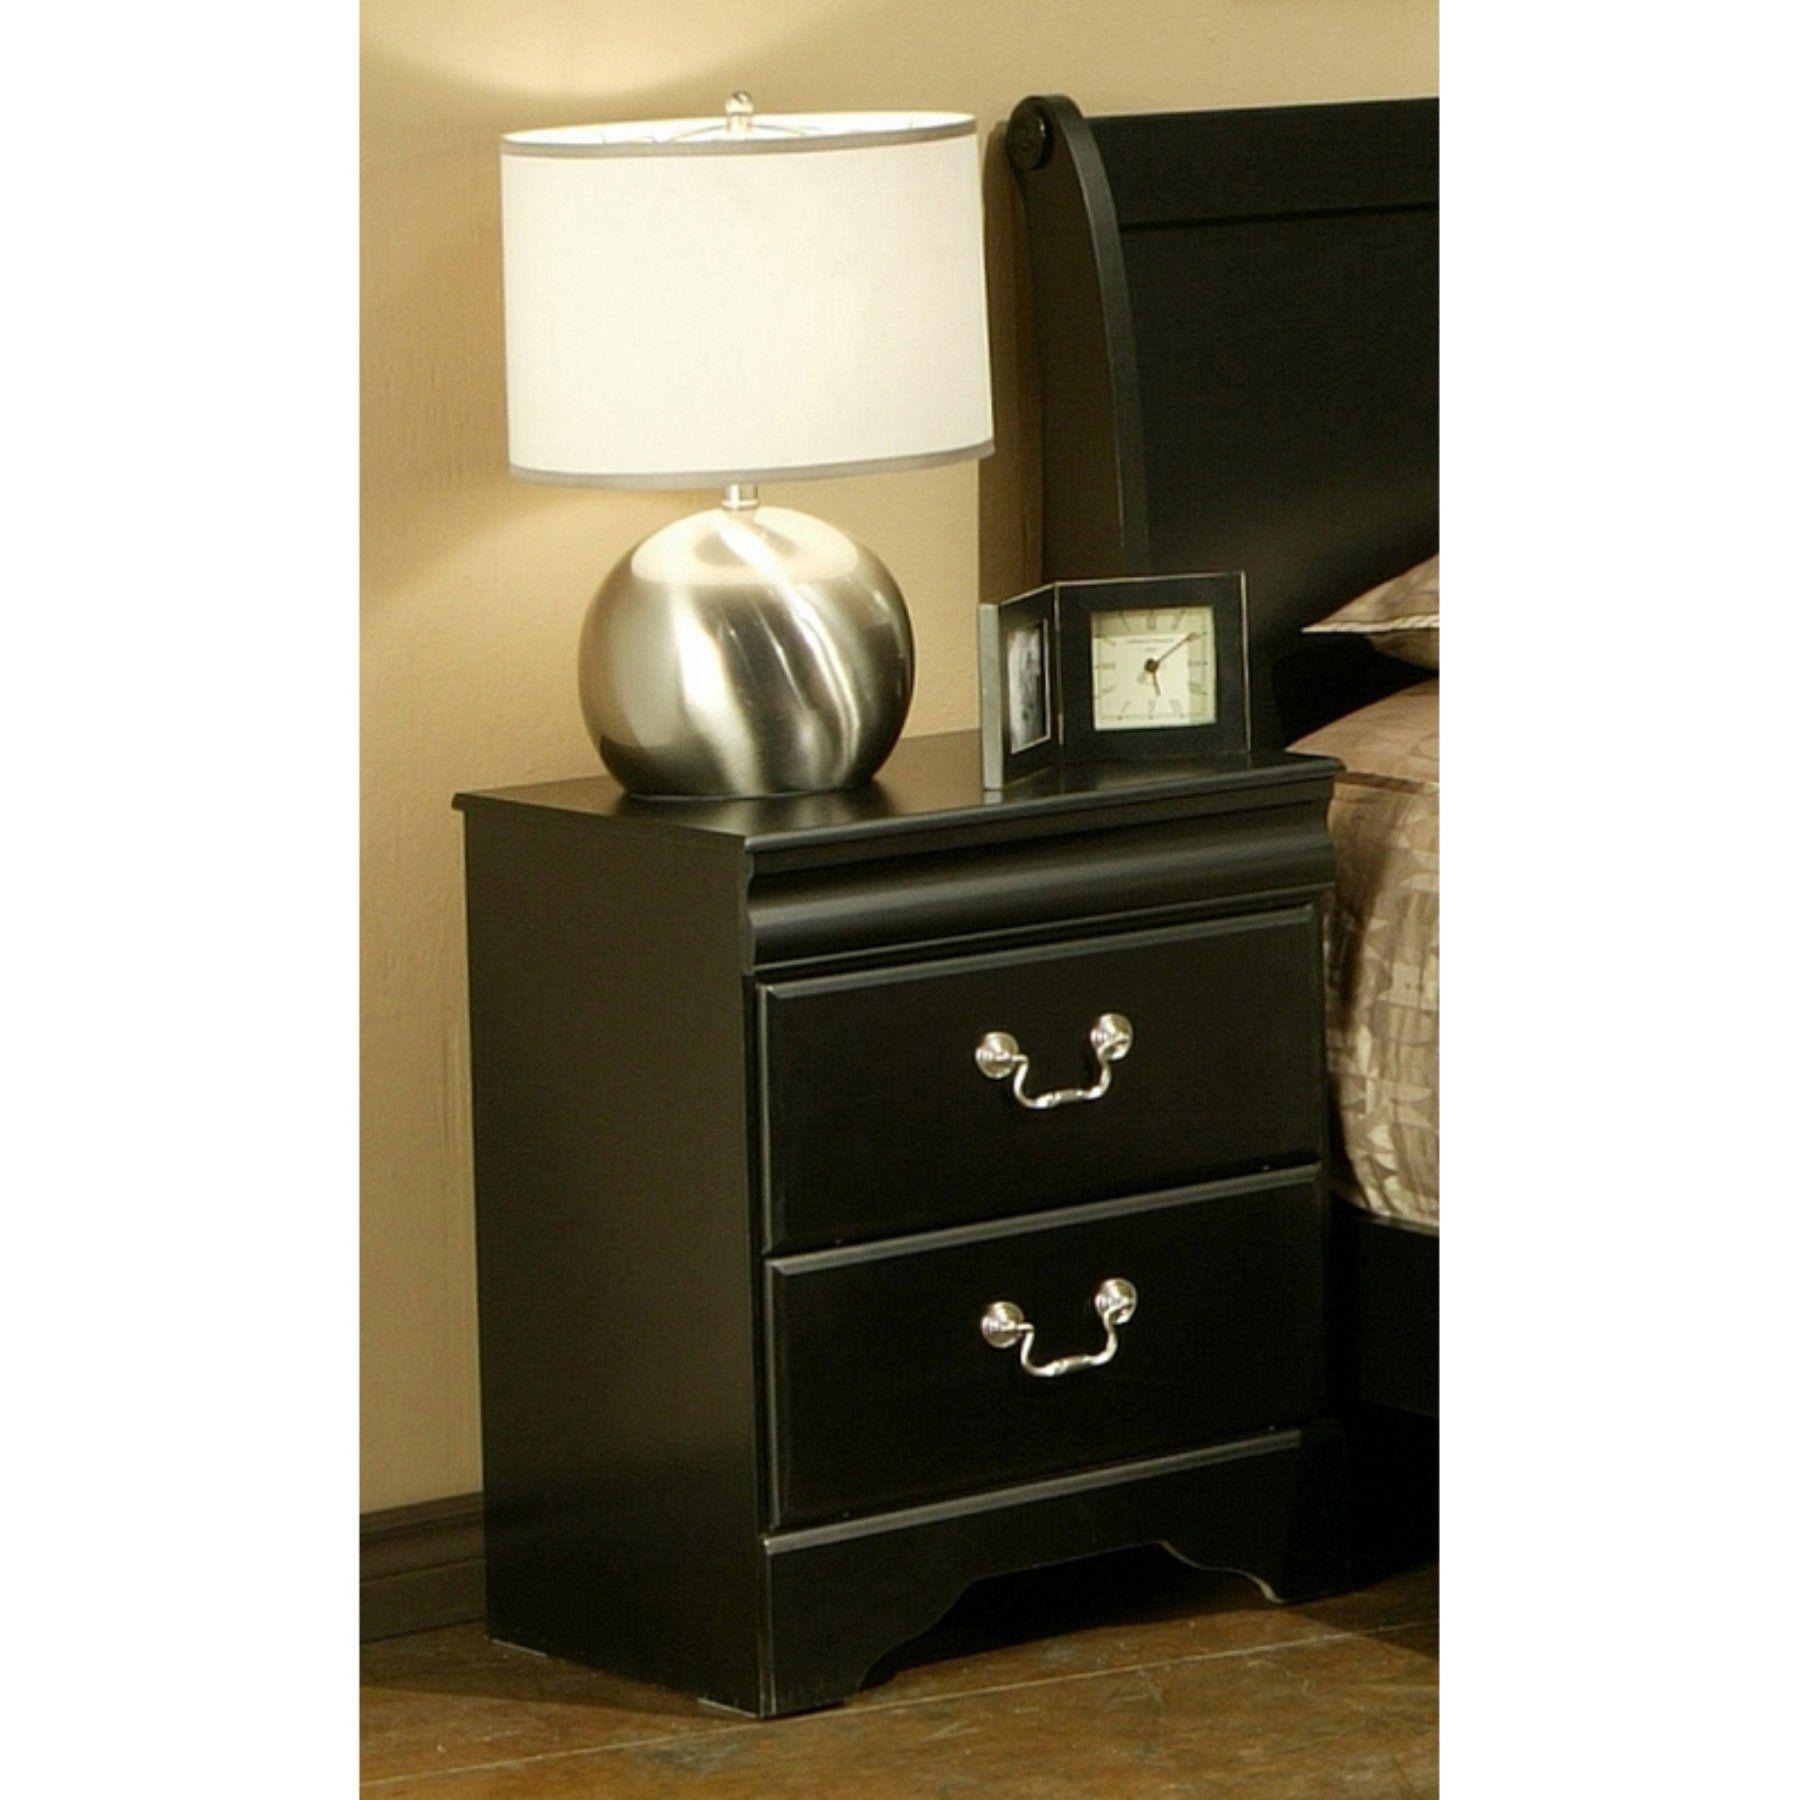 Sandberg Furniture Regency 2 Drawer Nightstand 32522